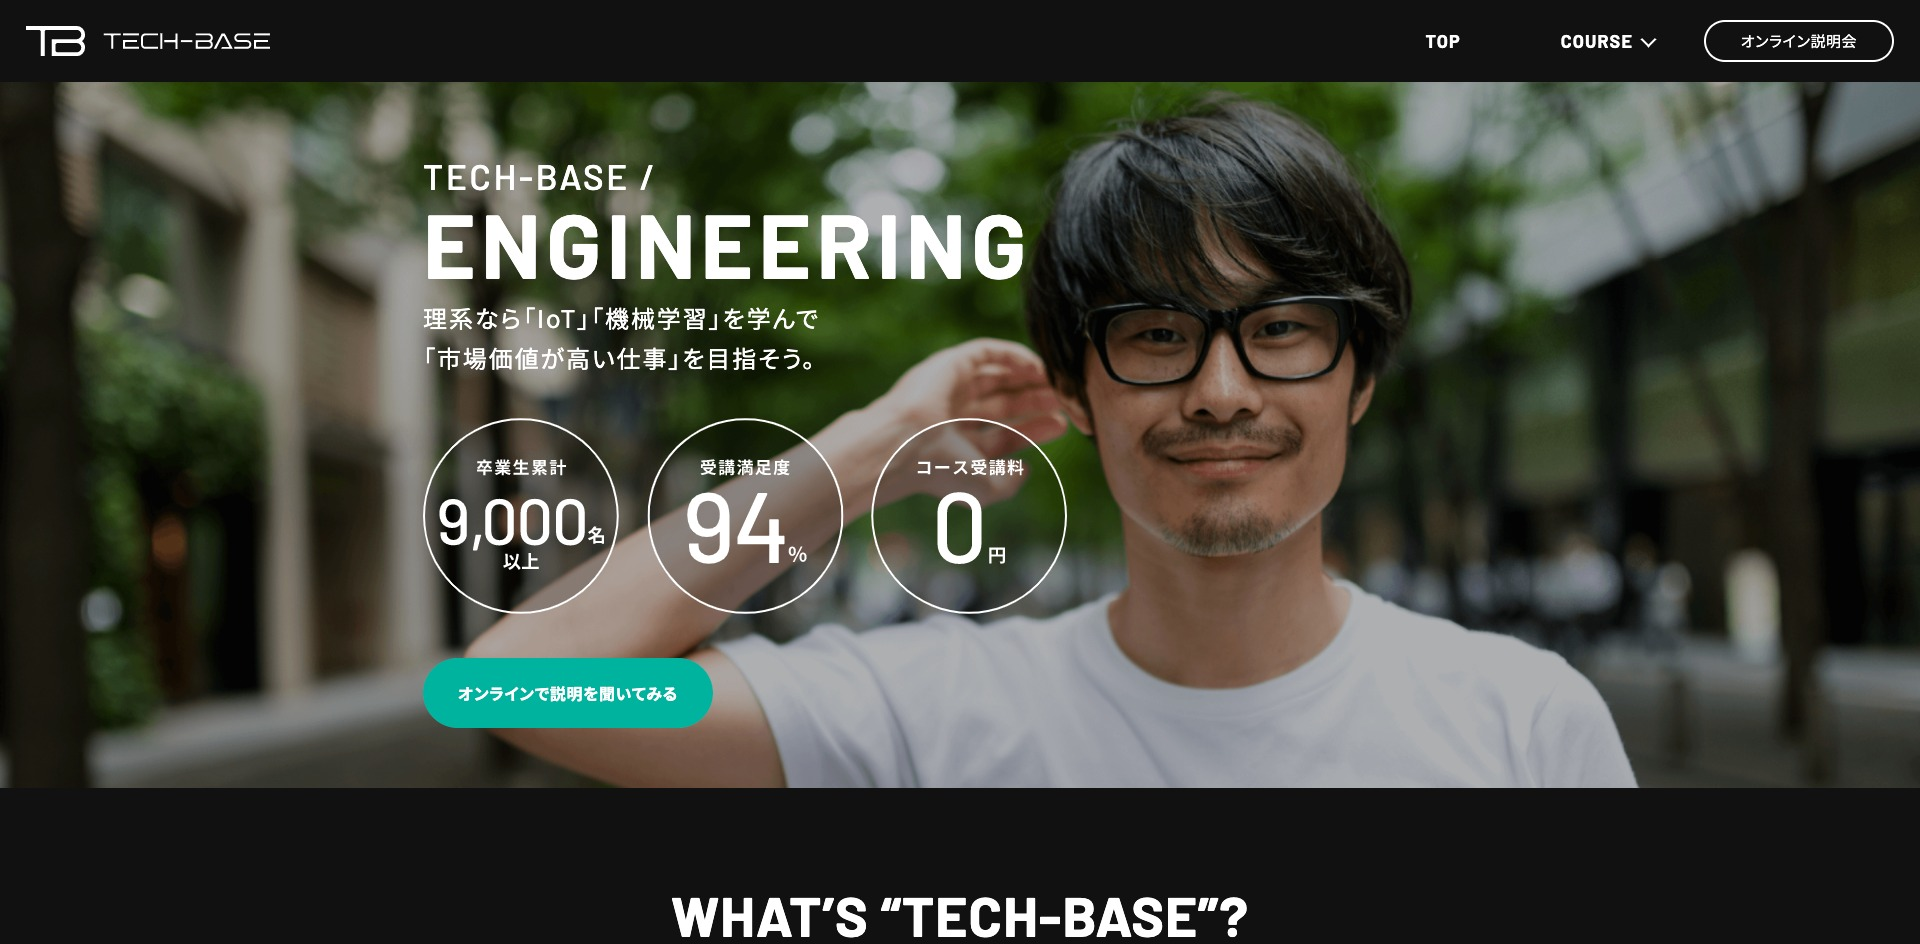 TECH-BASE Engineeringの公式サイトへ